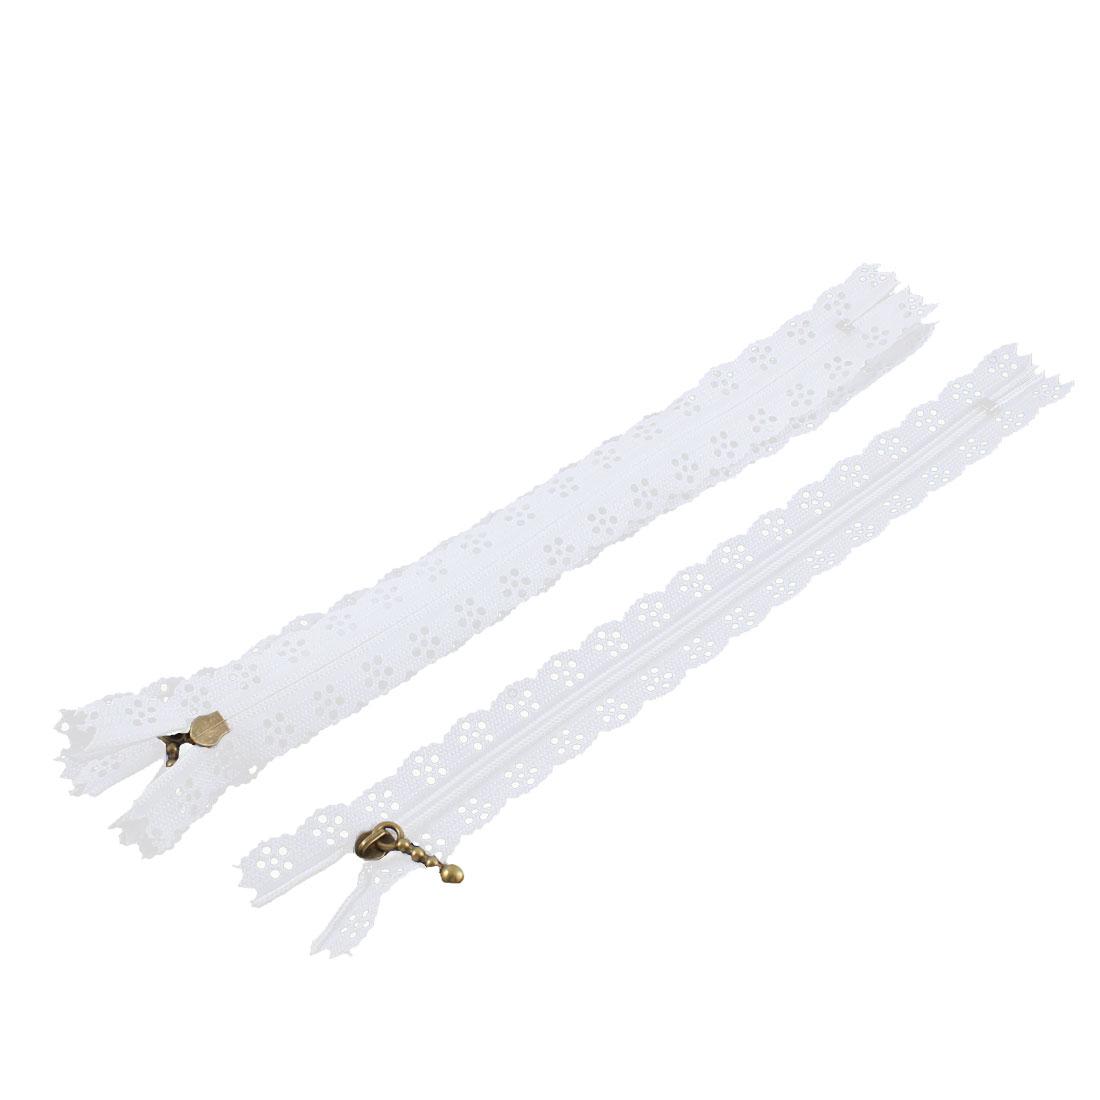 Nylon Coil Zippers Lace Edge Tailor Bag Clothing DIY Craft White 20cm 5 Pcs